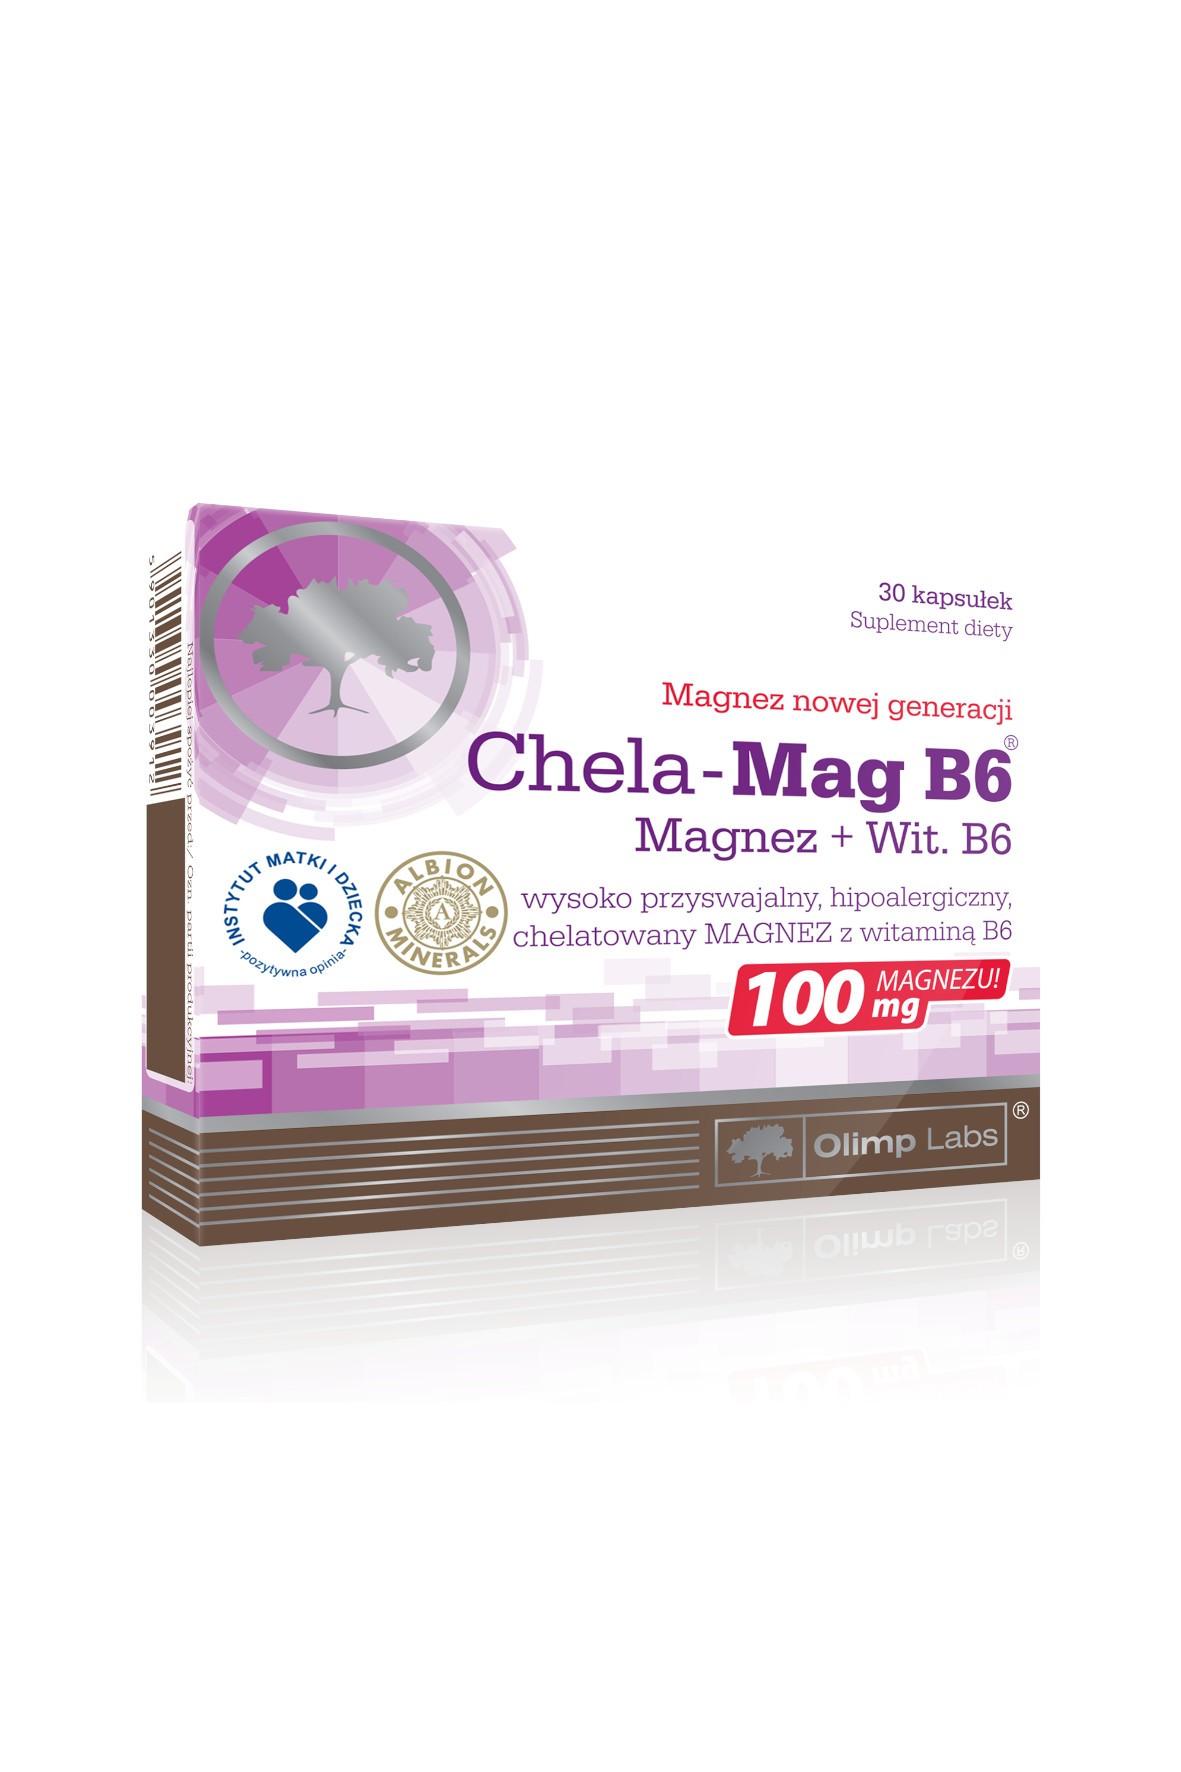 Chela-Mag B6 30 kapsułek TOP